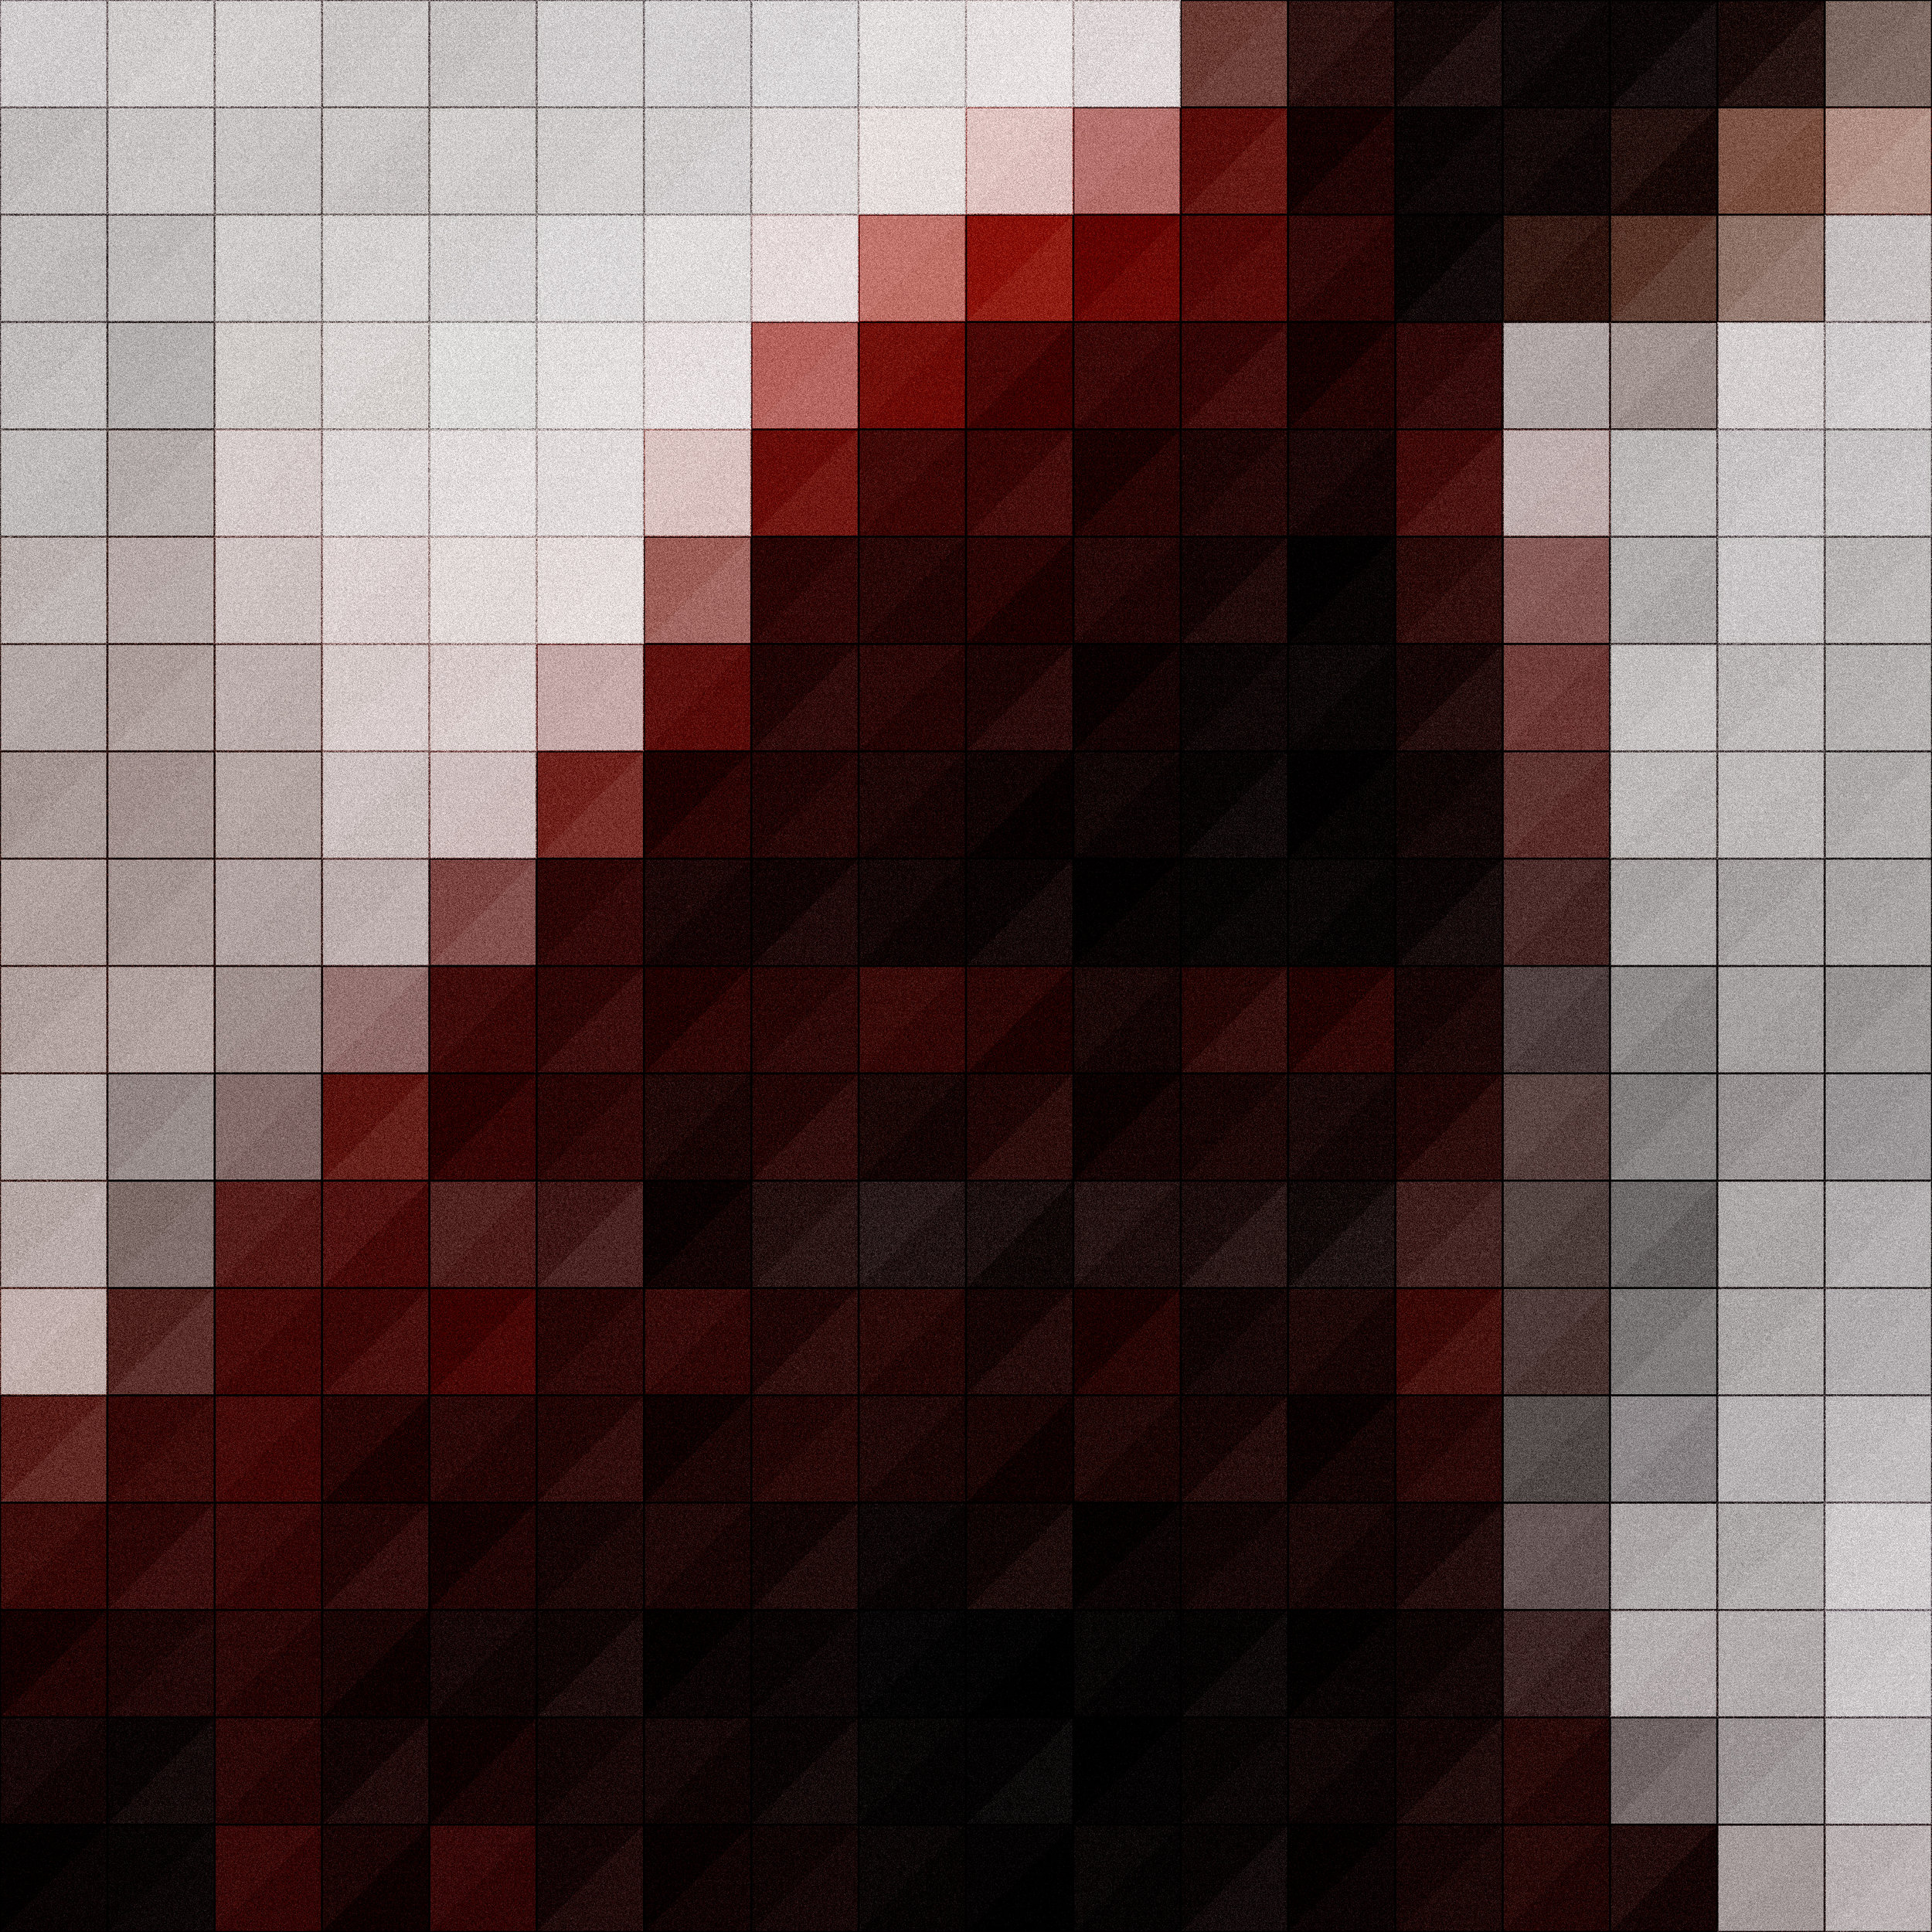 Pixel-StarWars-Kylo.jpg